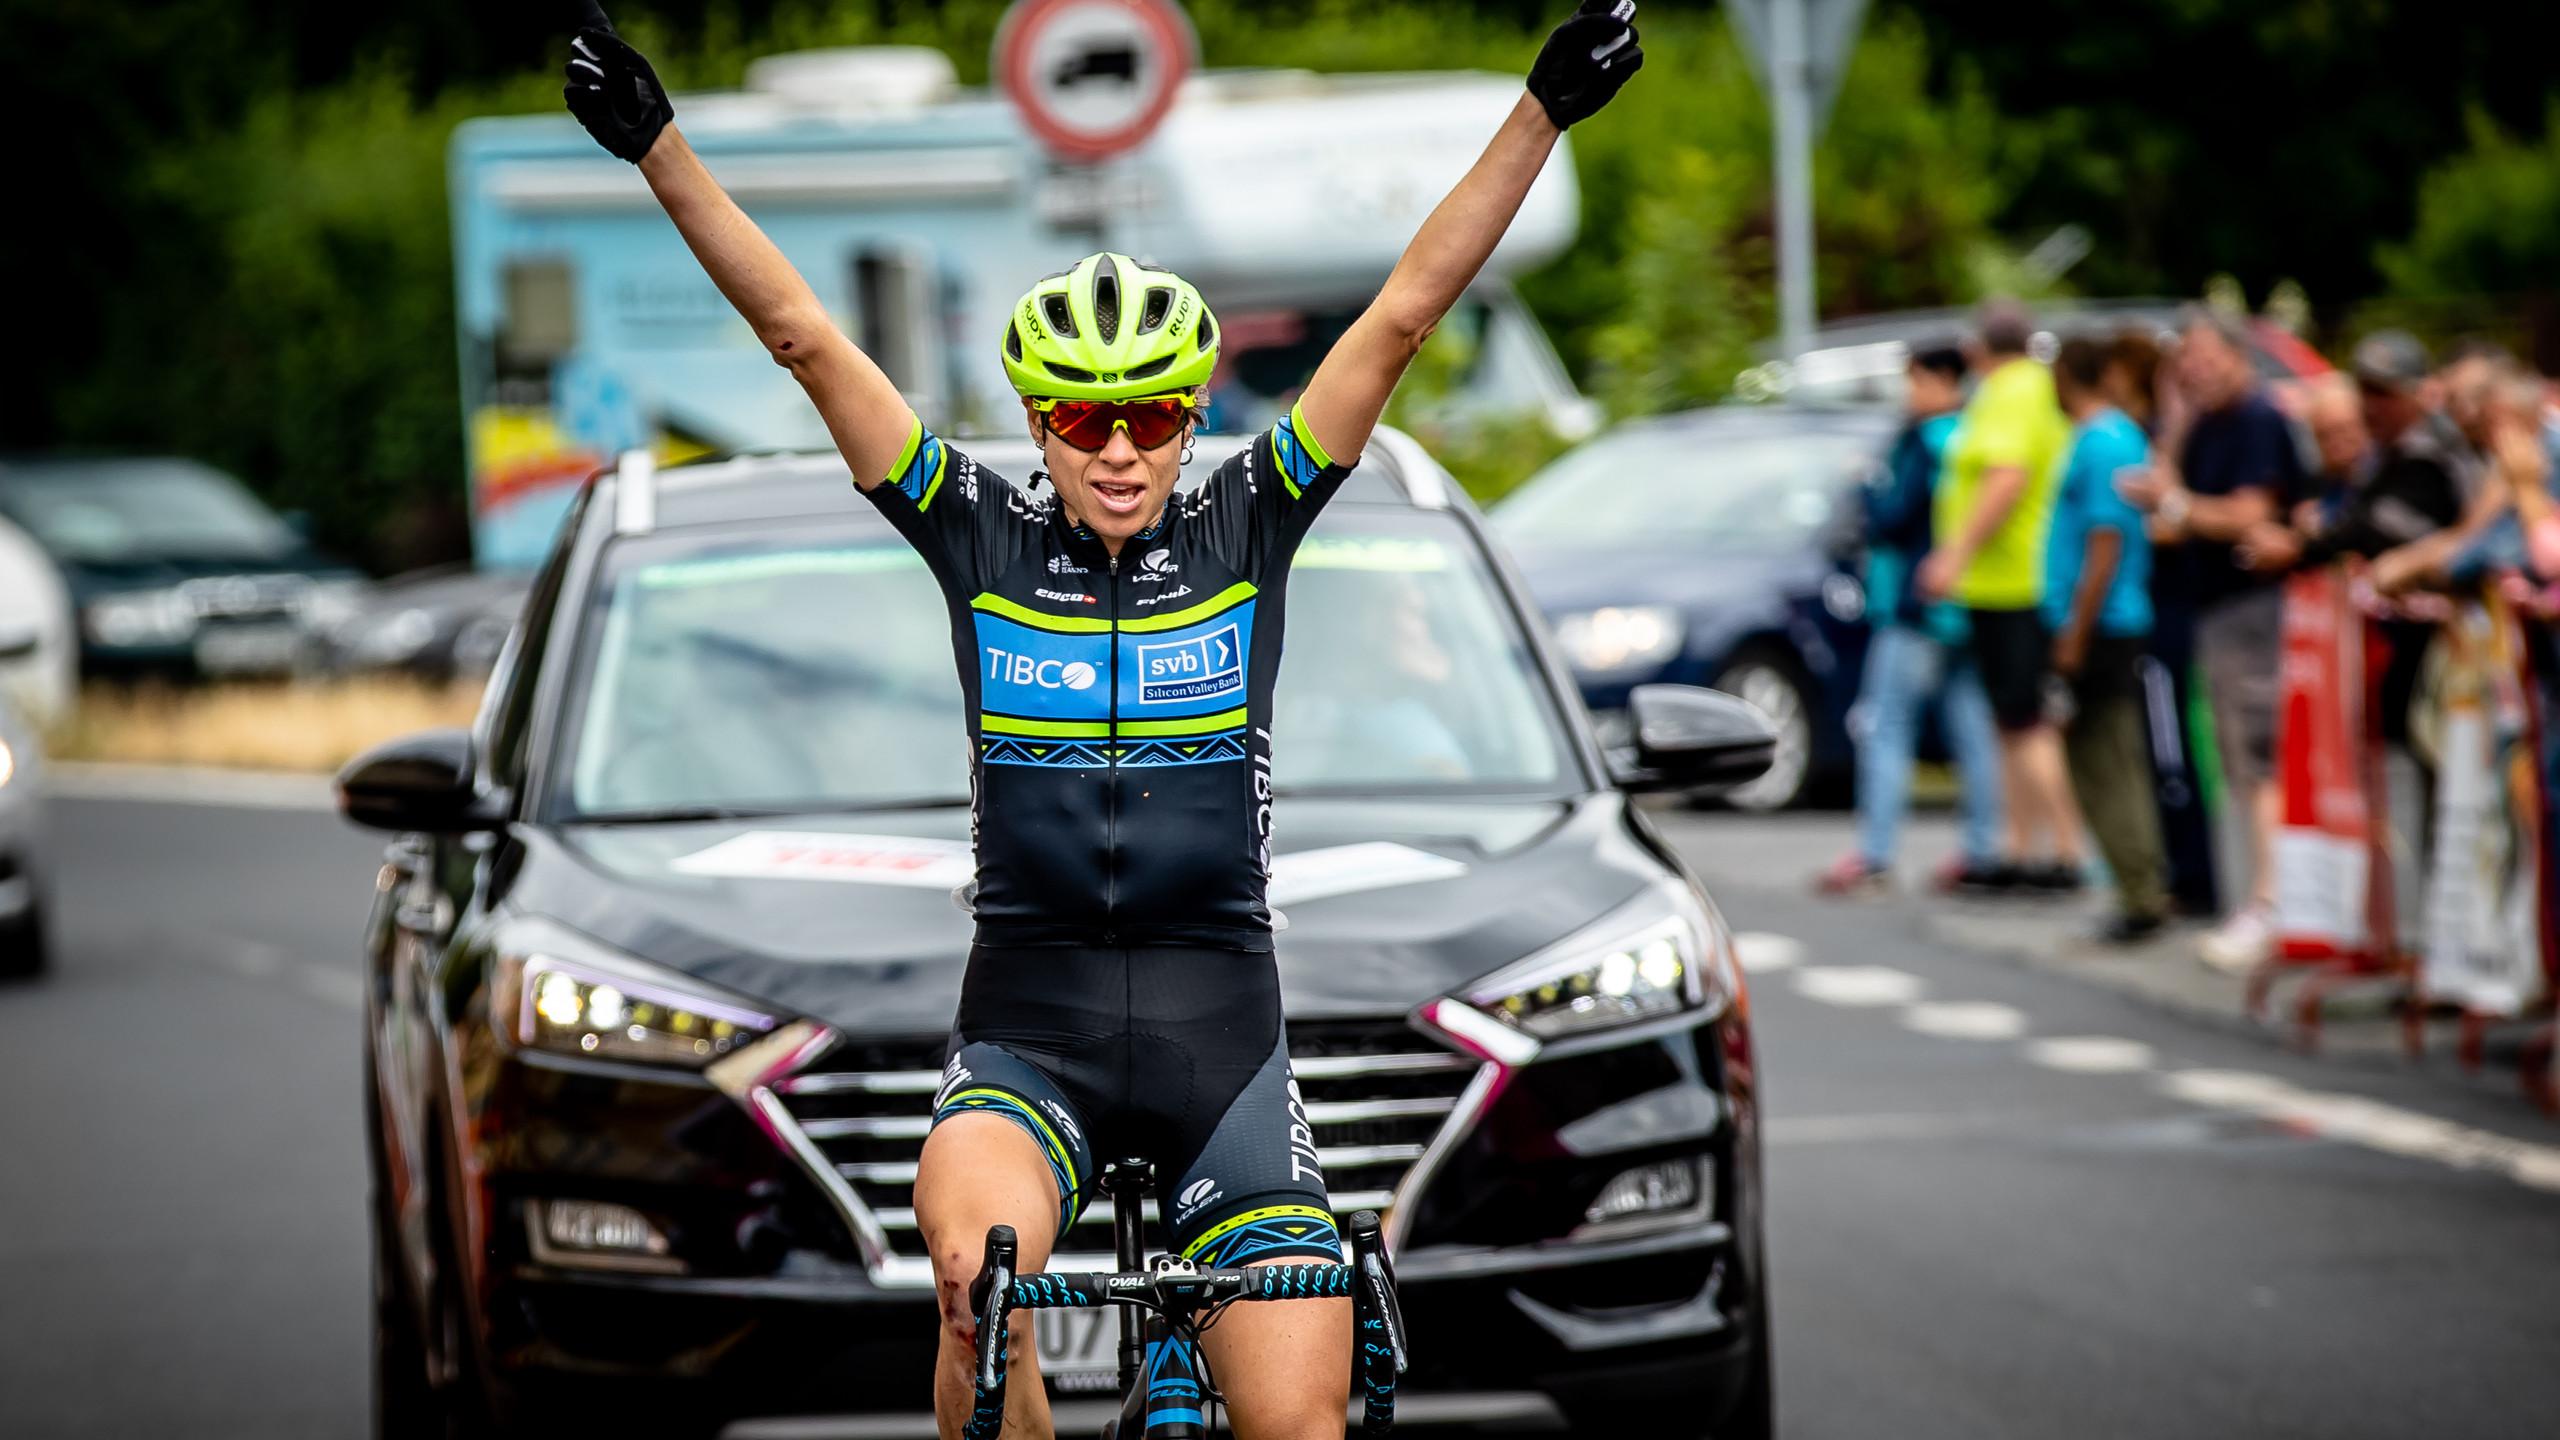 Chapman Wins Stage 2